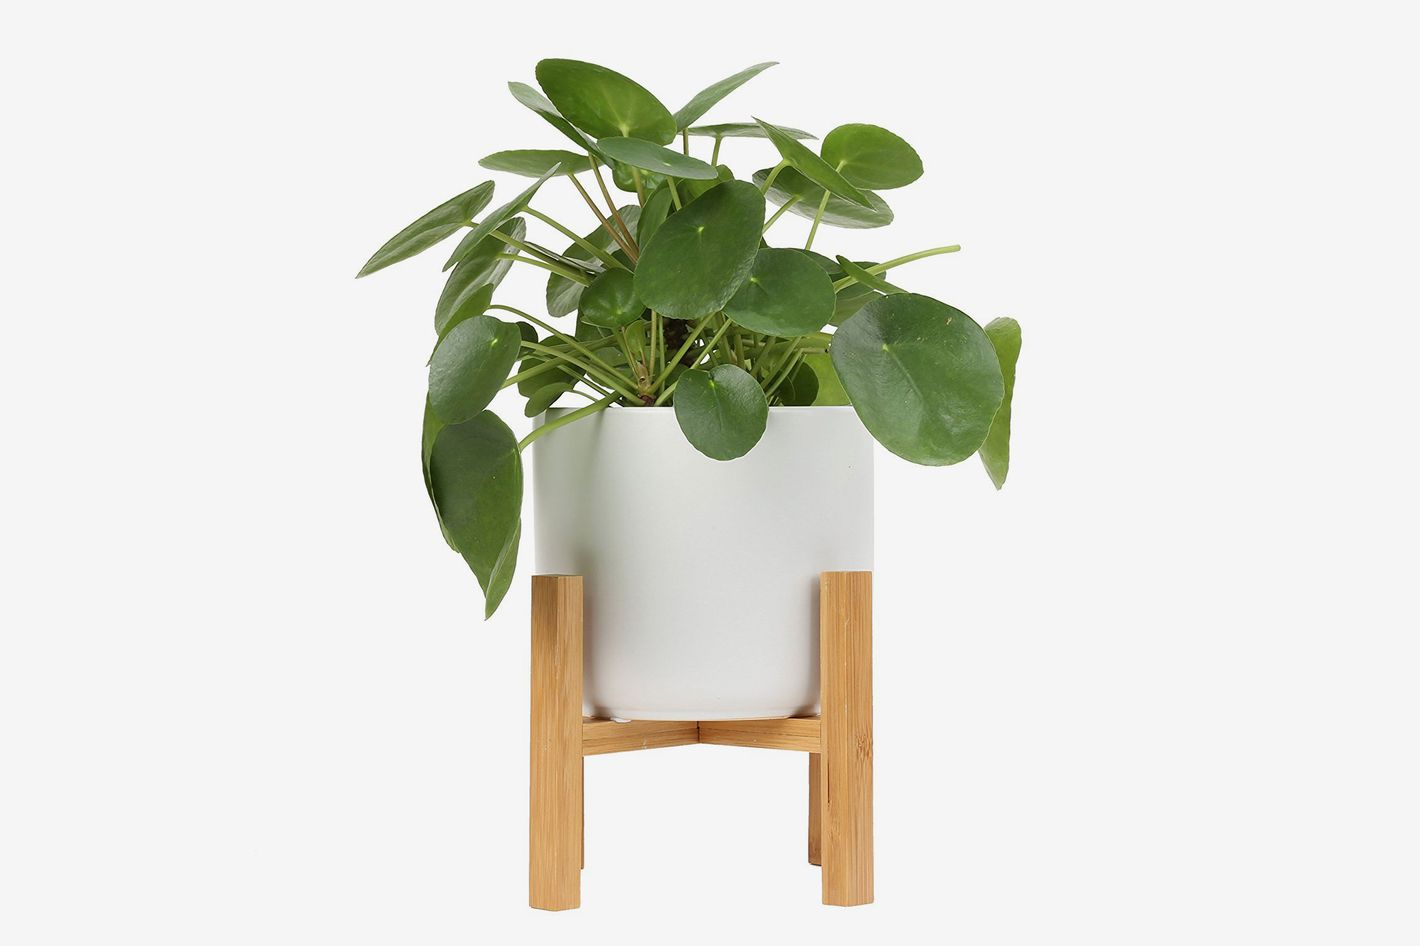 Costa Farms Pilea Sharing Indoor Tabletop Plant in 6-Inch Ceramic Planter